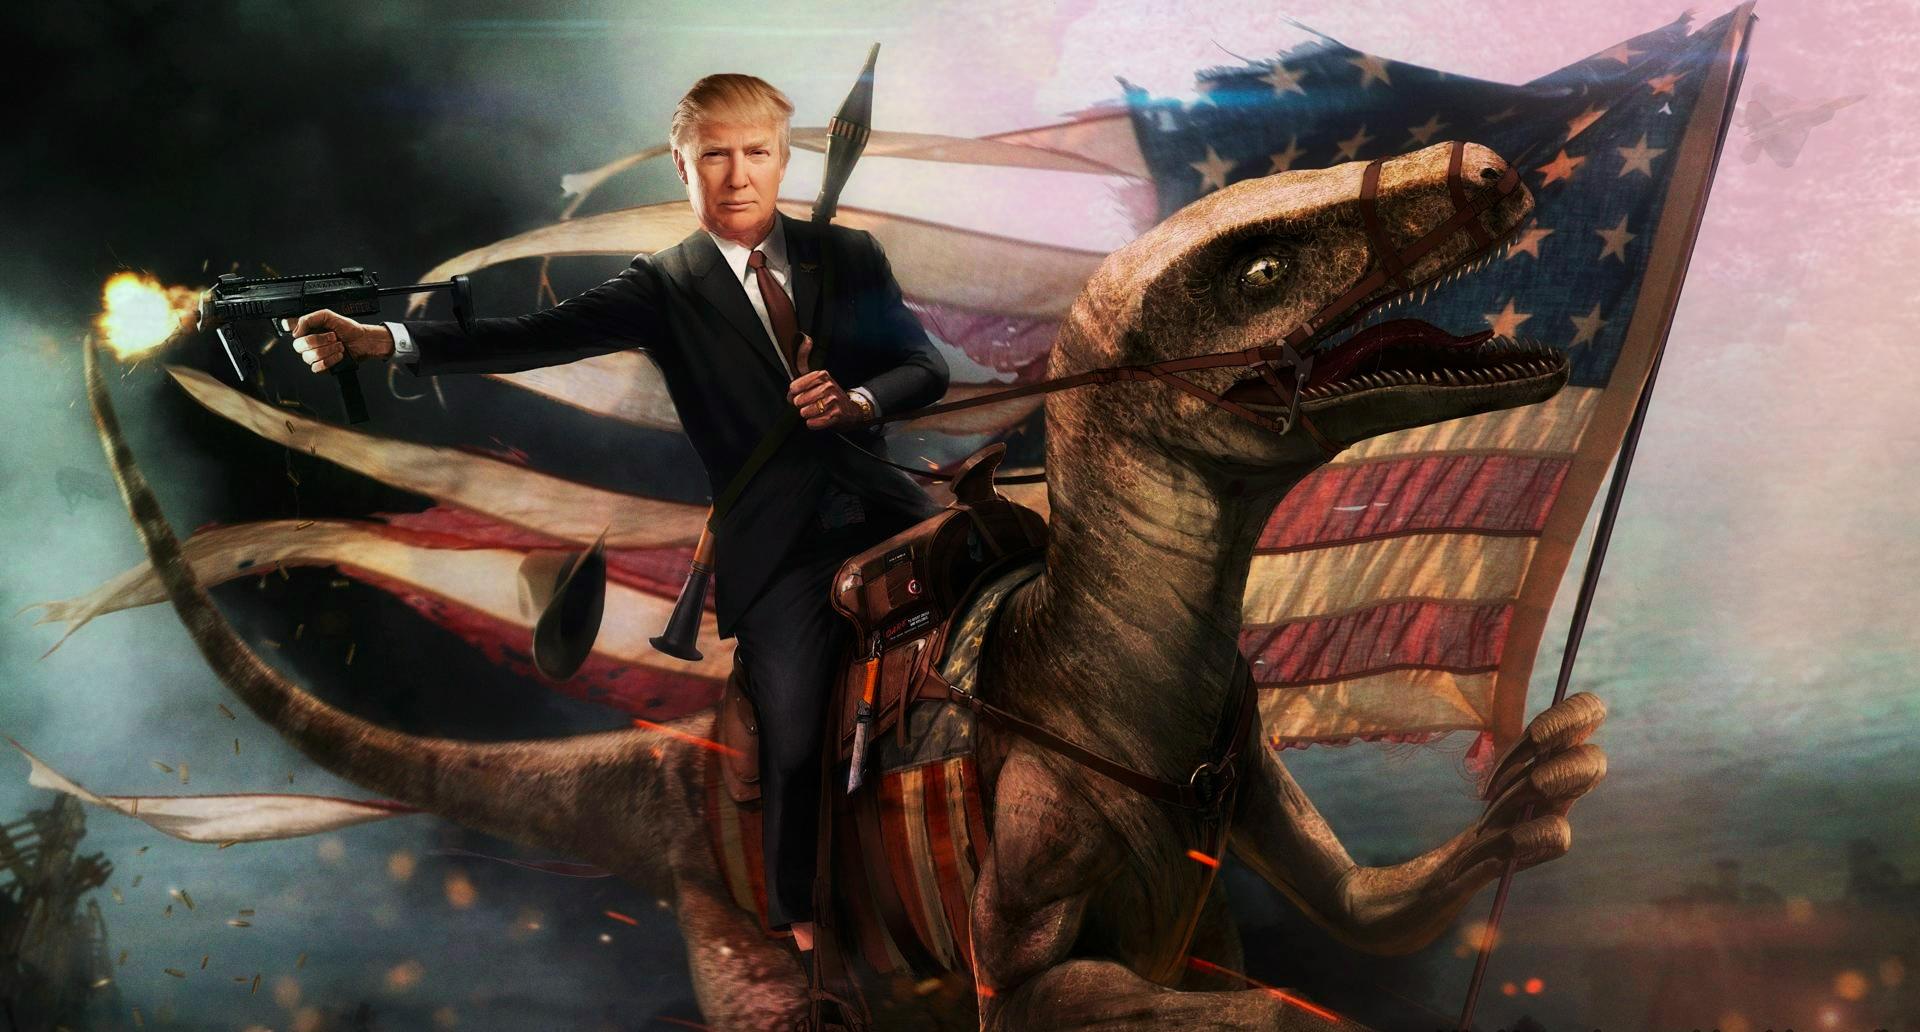 Desktop Wallpaper Donald Trump Digital Artwork Hd Image Picture